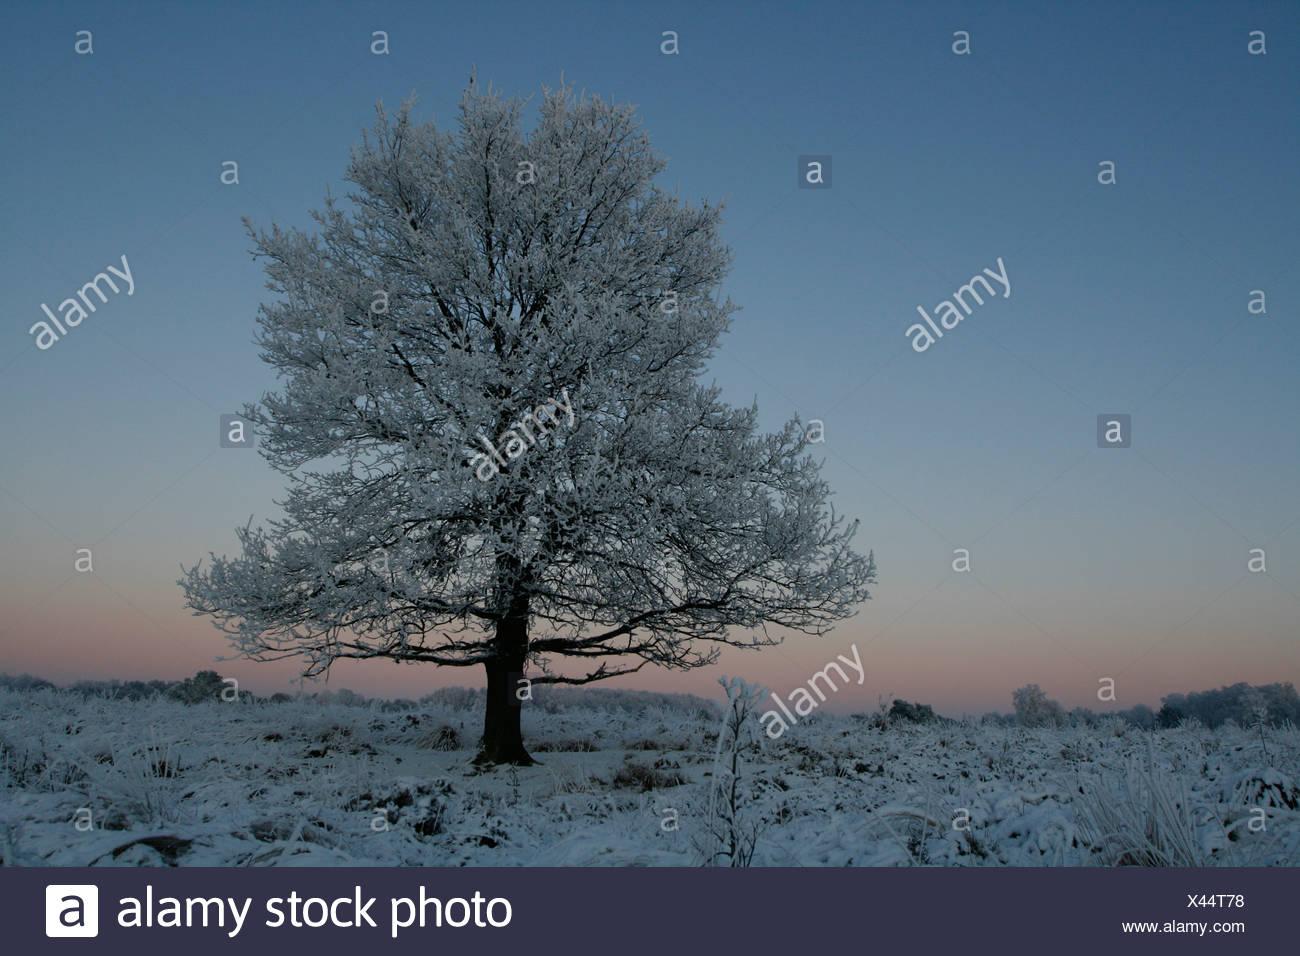 solitaire zomereik met rijp in winters landschap bij zonsopgang; solitary oak with rime in winter landscape at sunrise - Stock Image